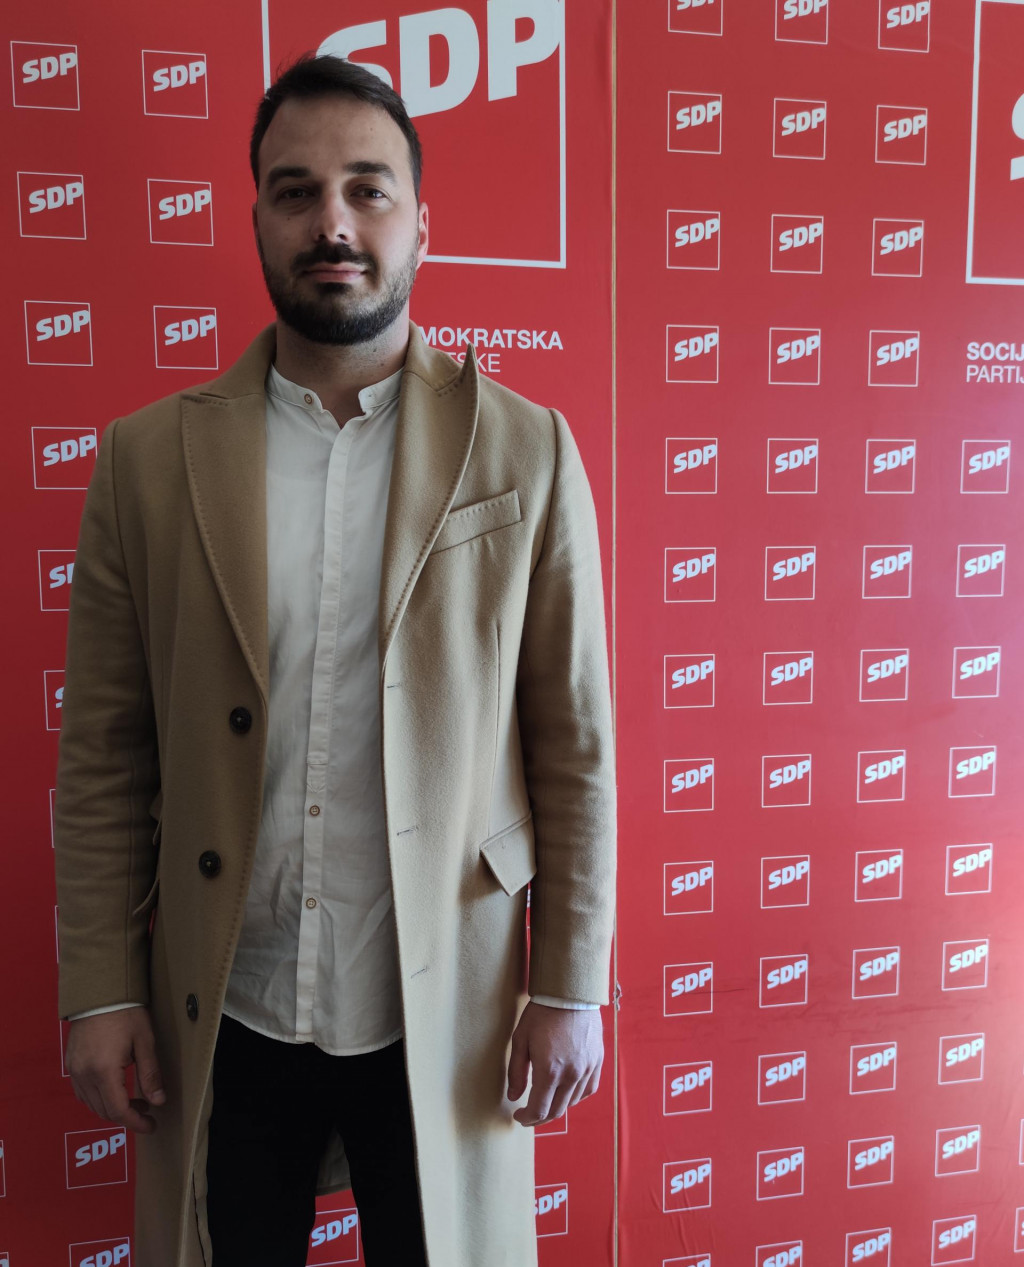 Ivan Tropan, kandidat SDP-a za gradonačelnika dubrovnika